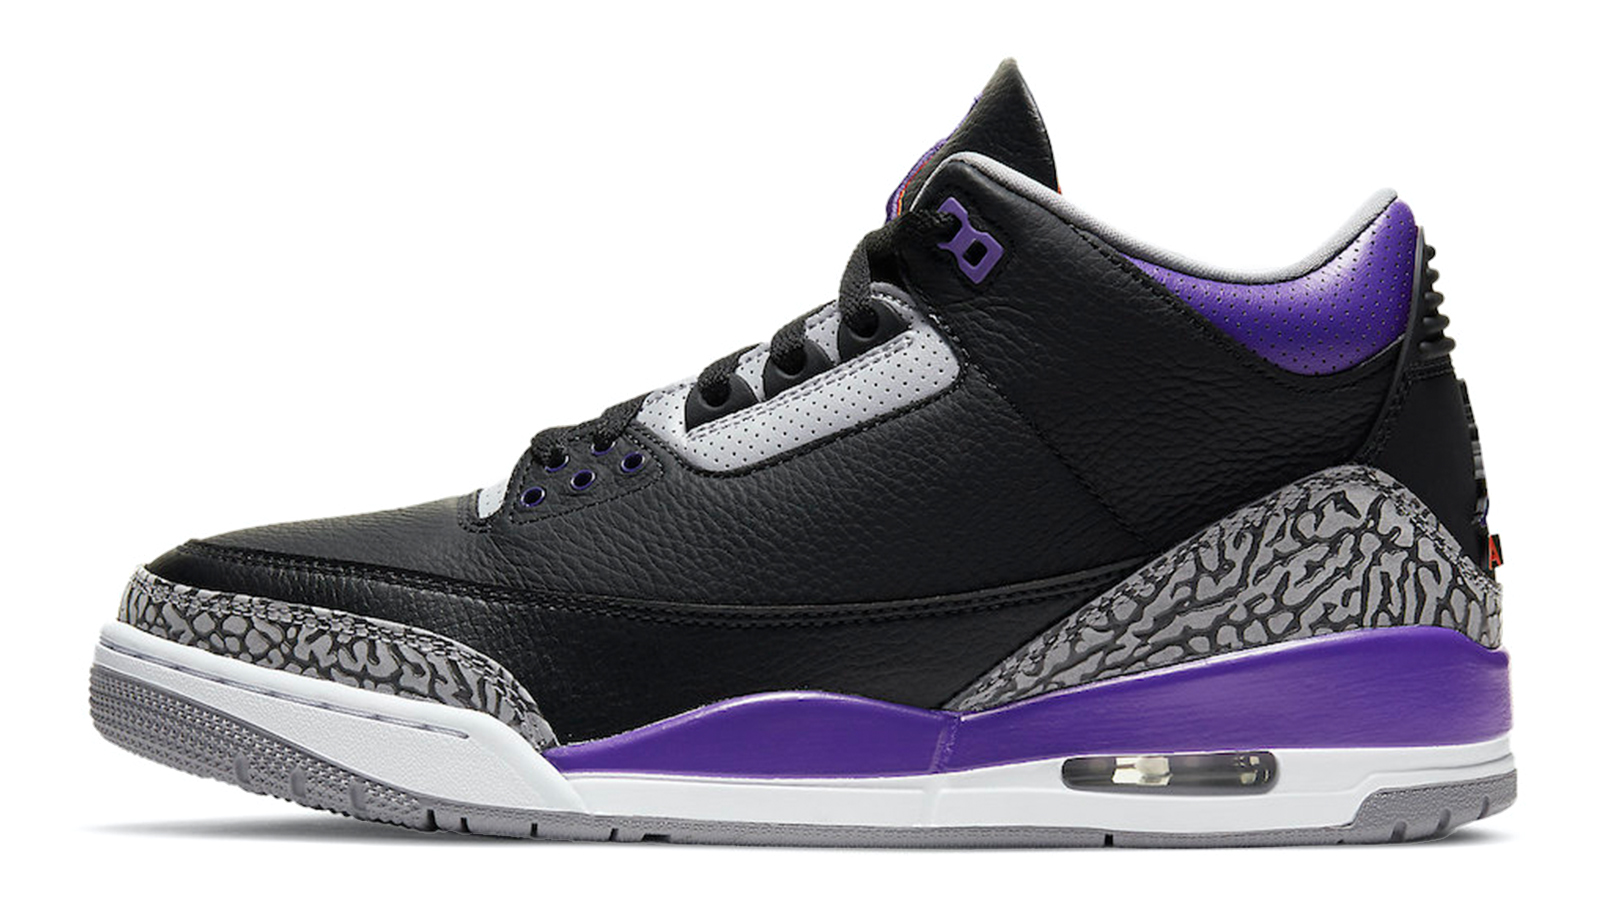 Air Jordan 3 Black Court Purple CT8532-050